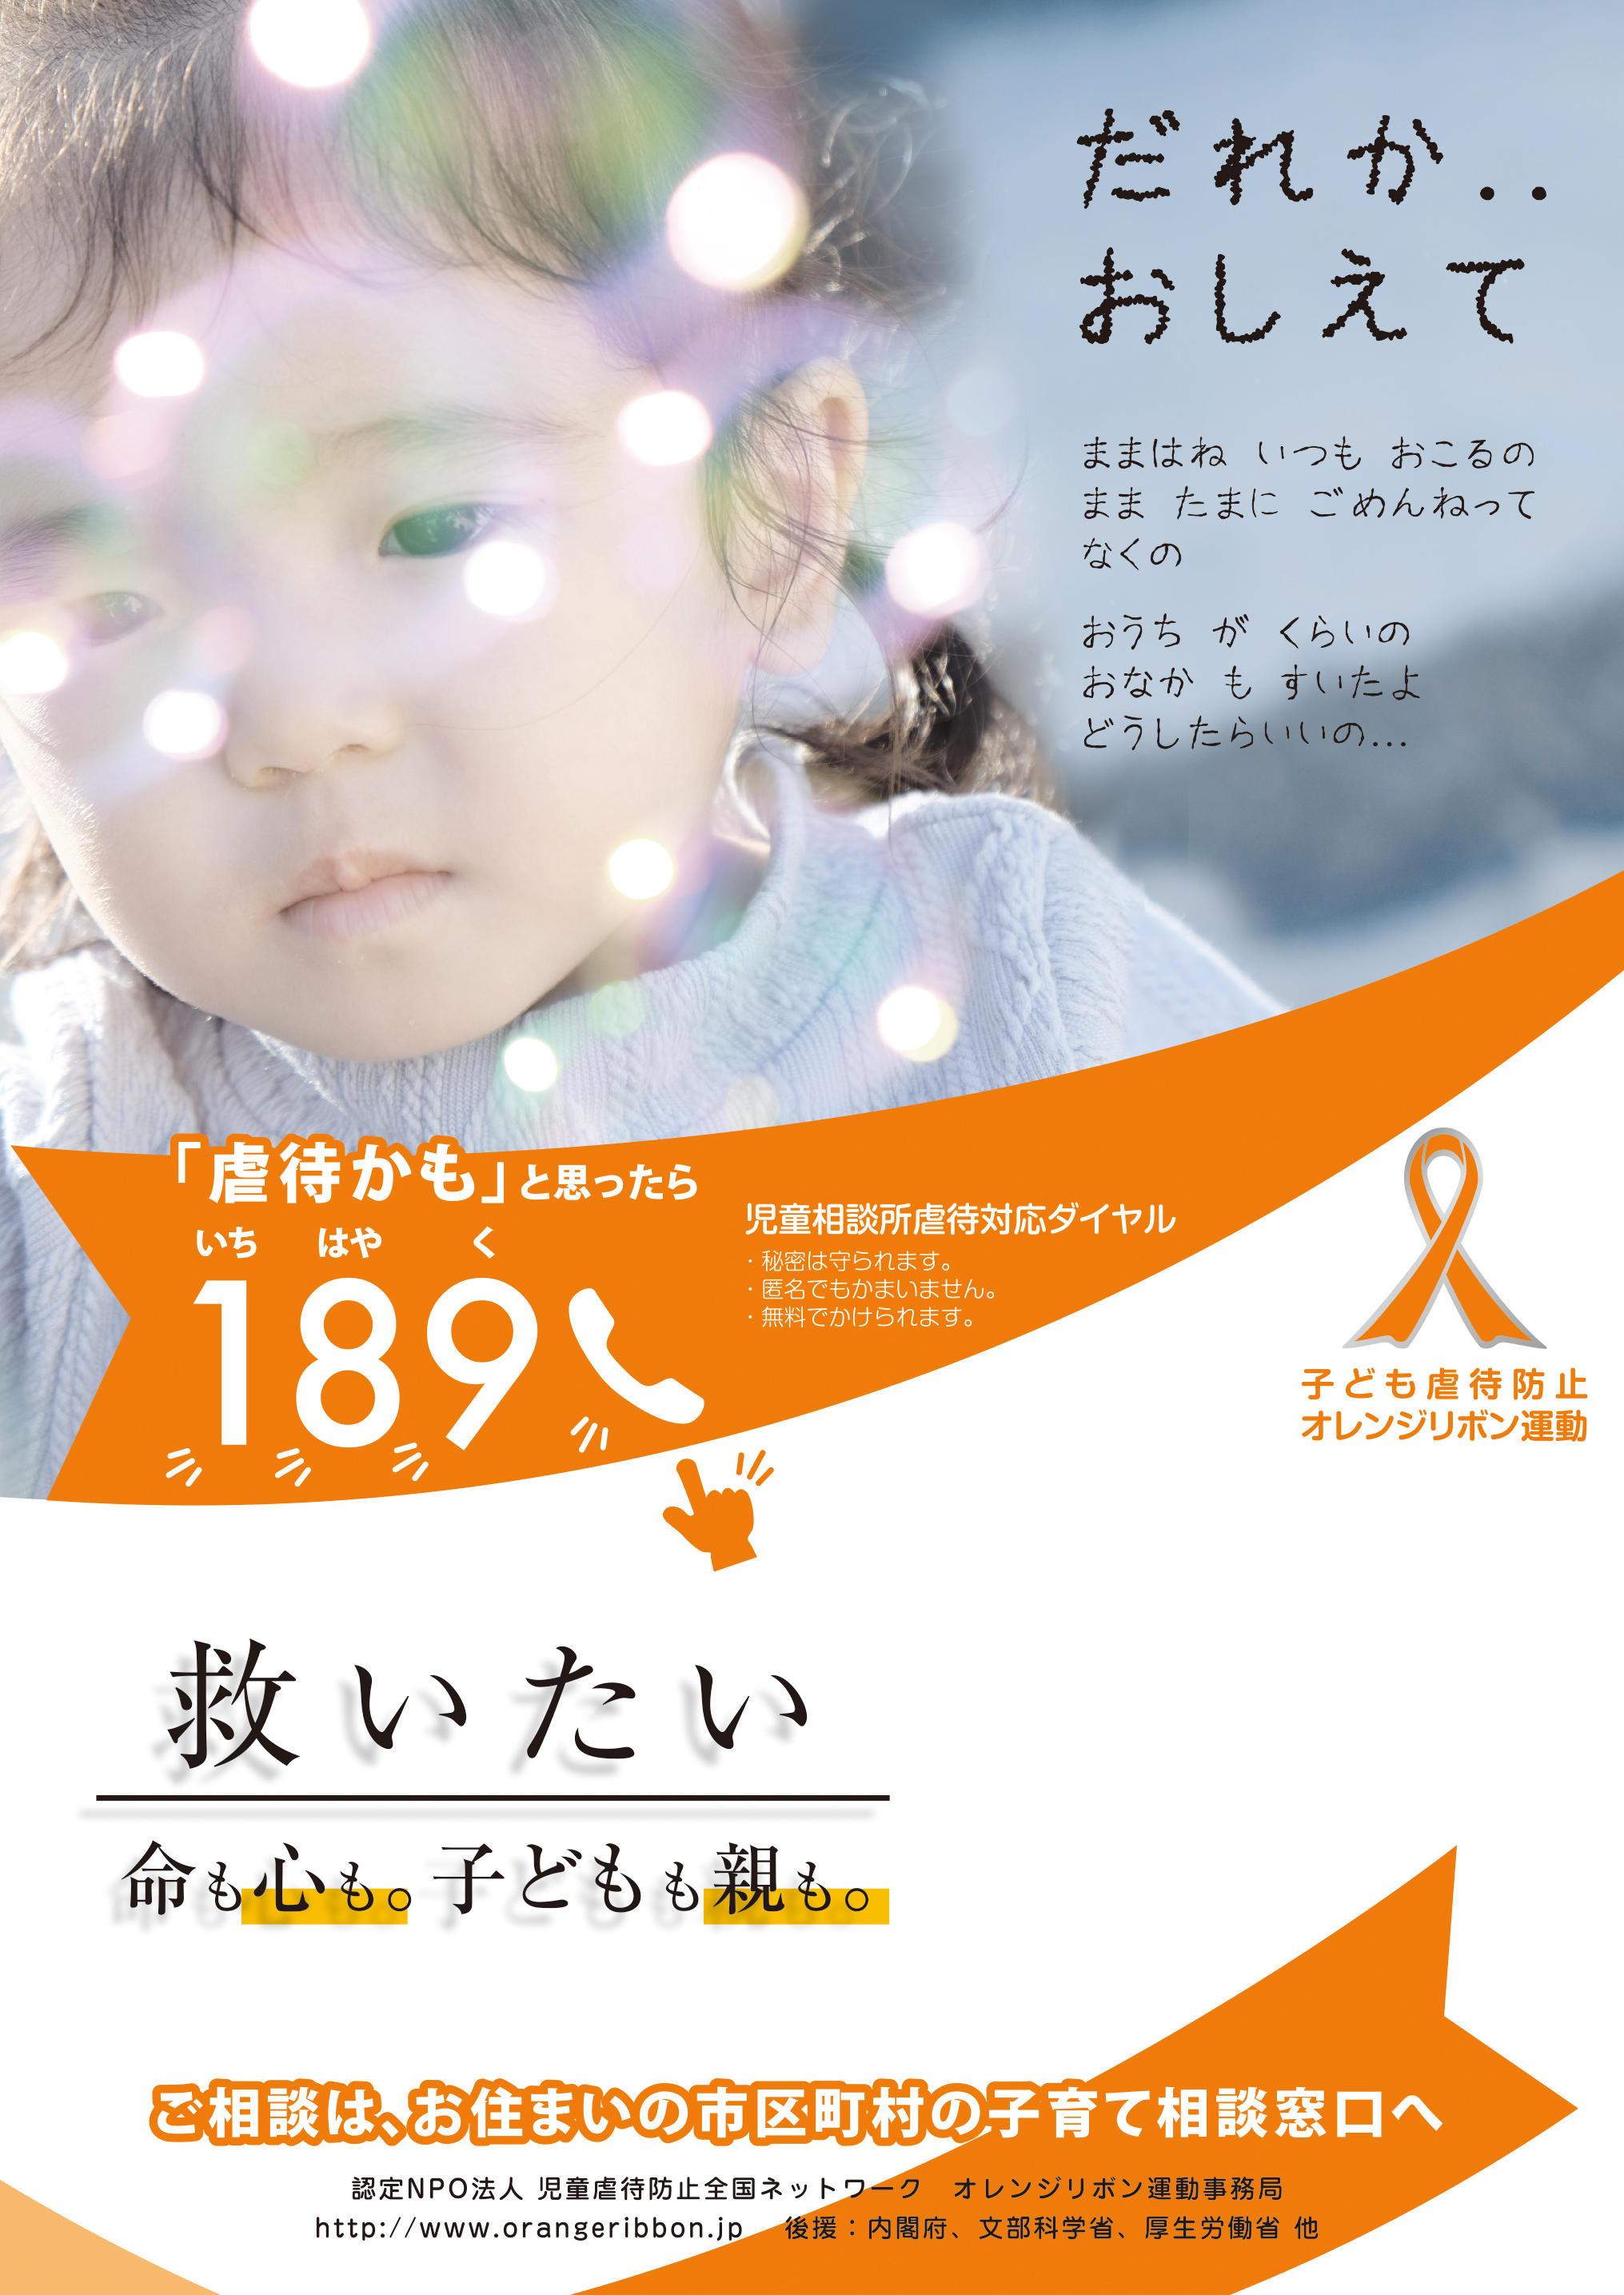 http://www.orangeribbon.jp/info/npo/91917a09b99e2c62fe2760d58dfb30c564b4fe91.jpg